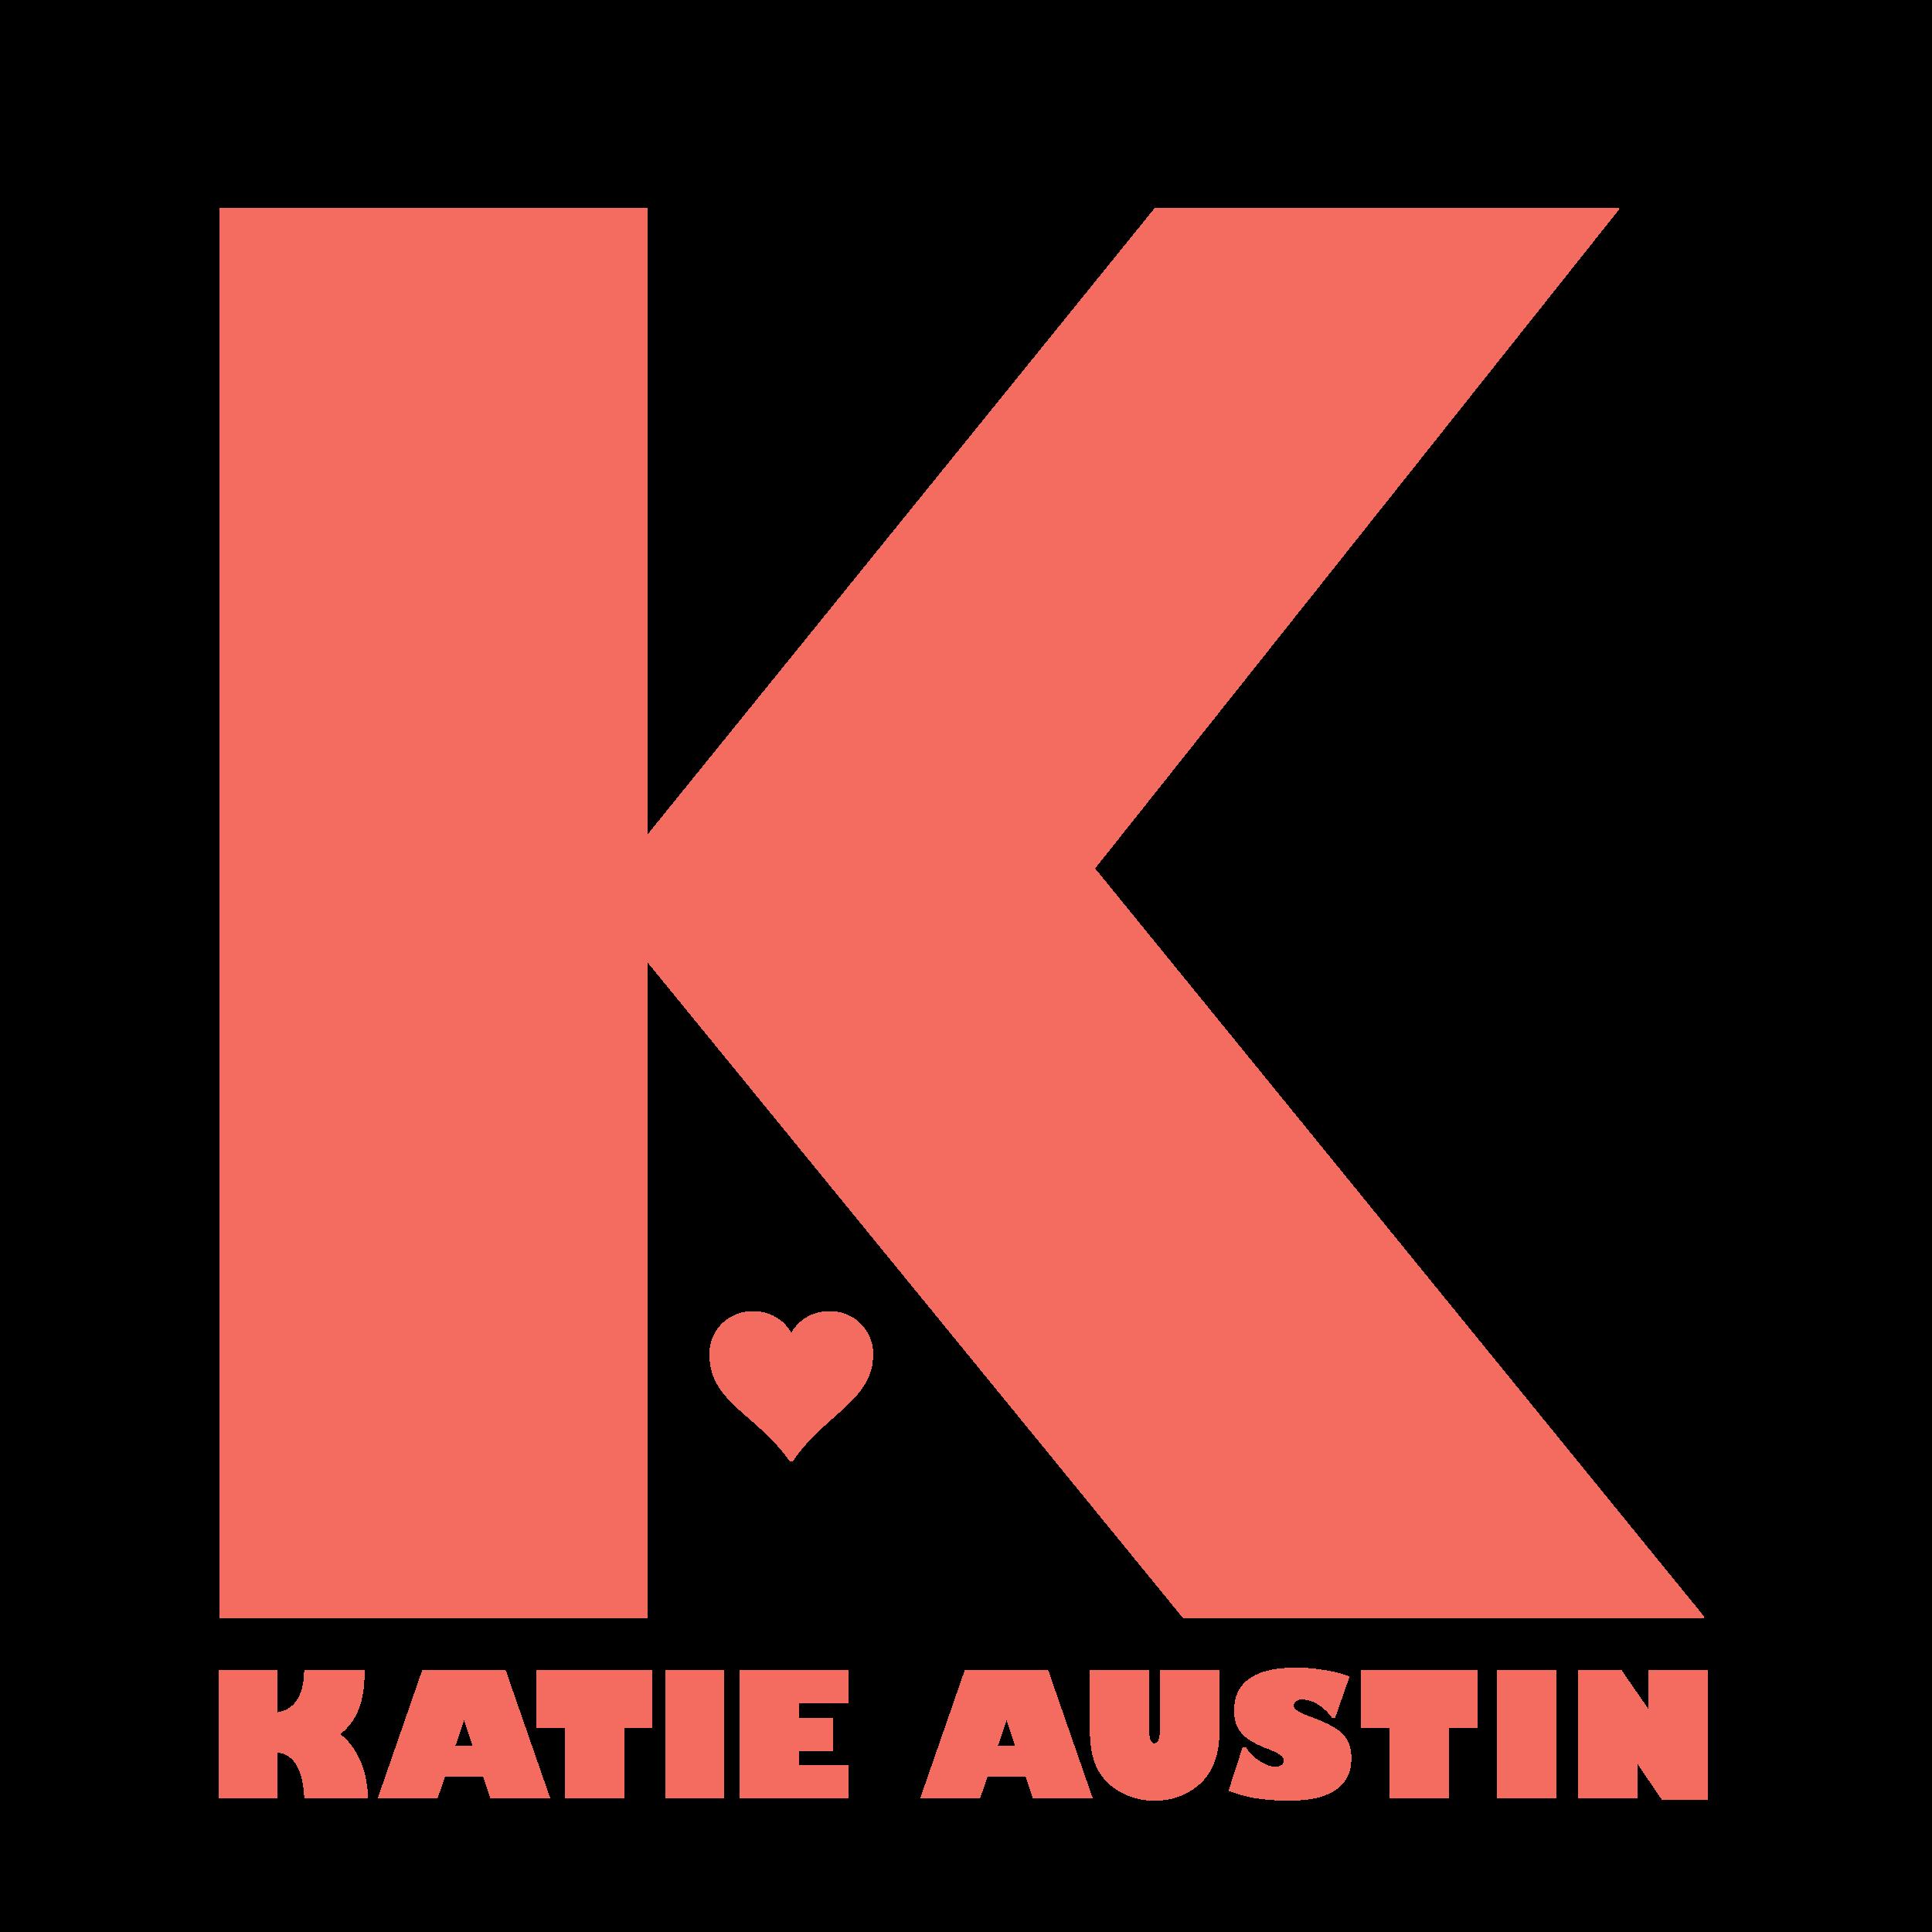 Katie Austin LOGO-FINAL_FULL LOGO - CORAL.png